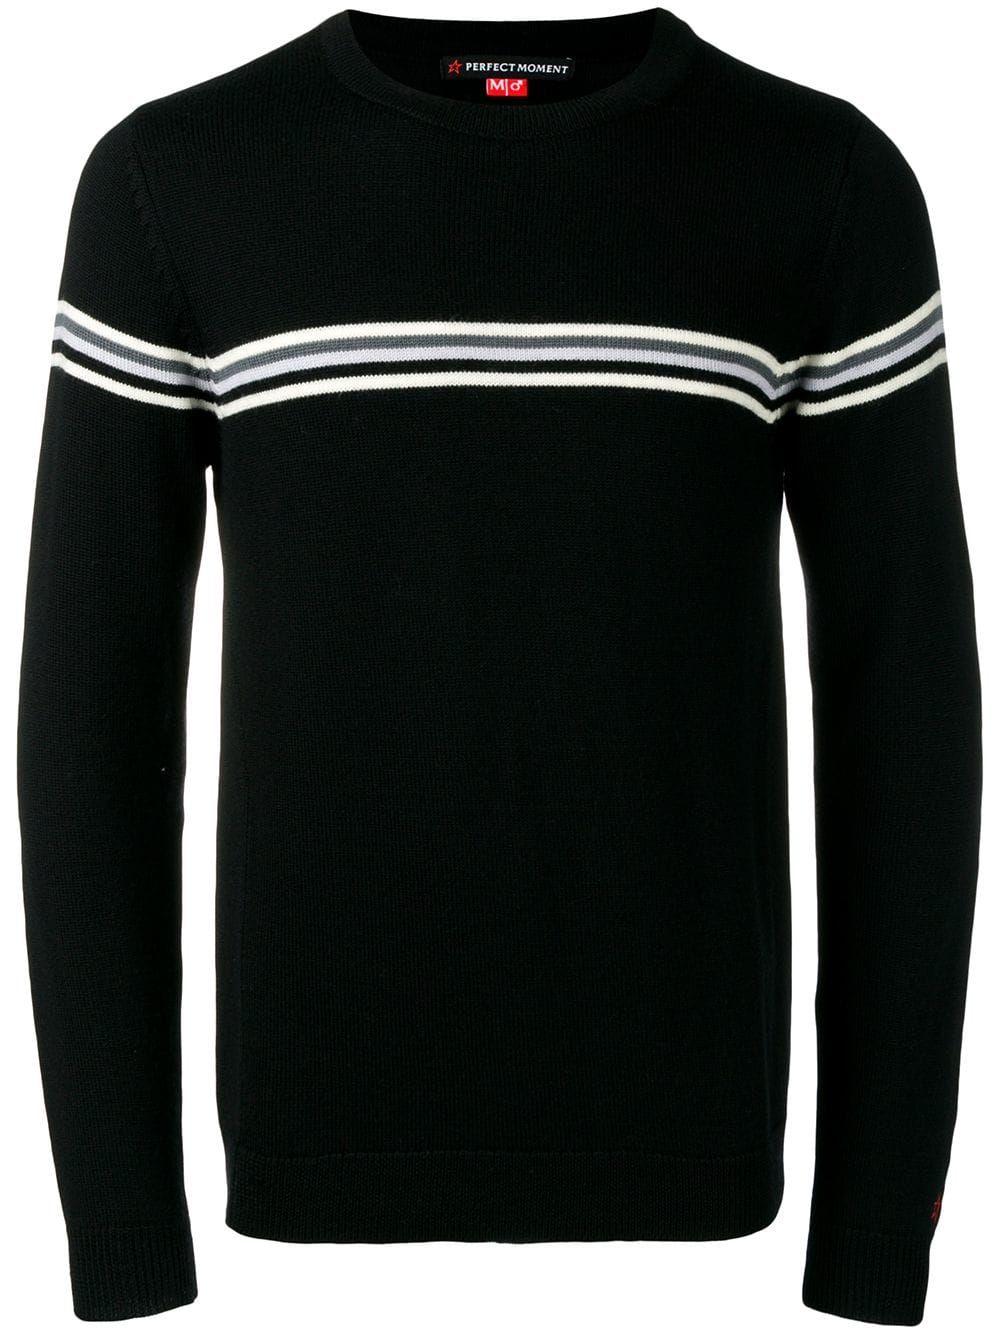 Perfect for Winter Lyle /& Scott Crew Neck Cotton Merino jumper For Men